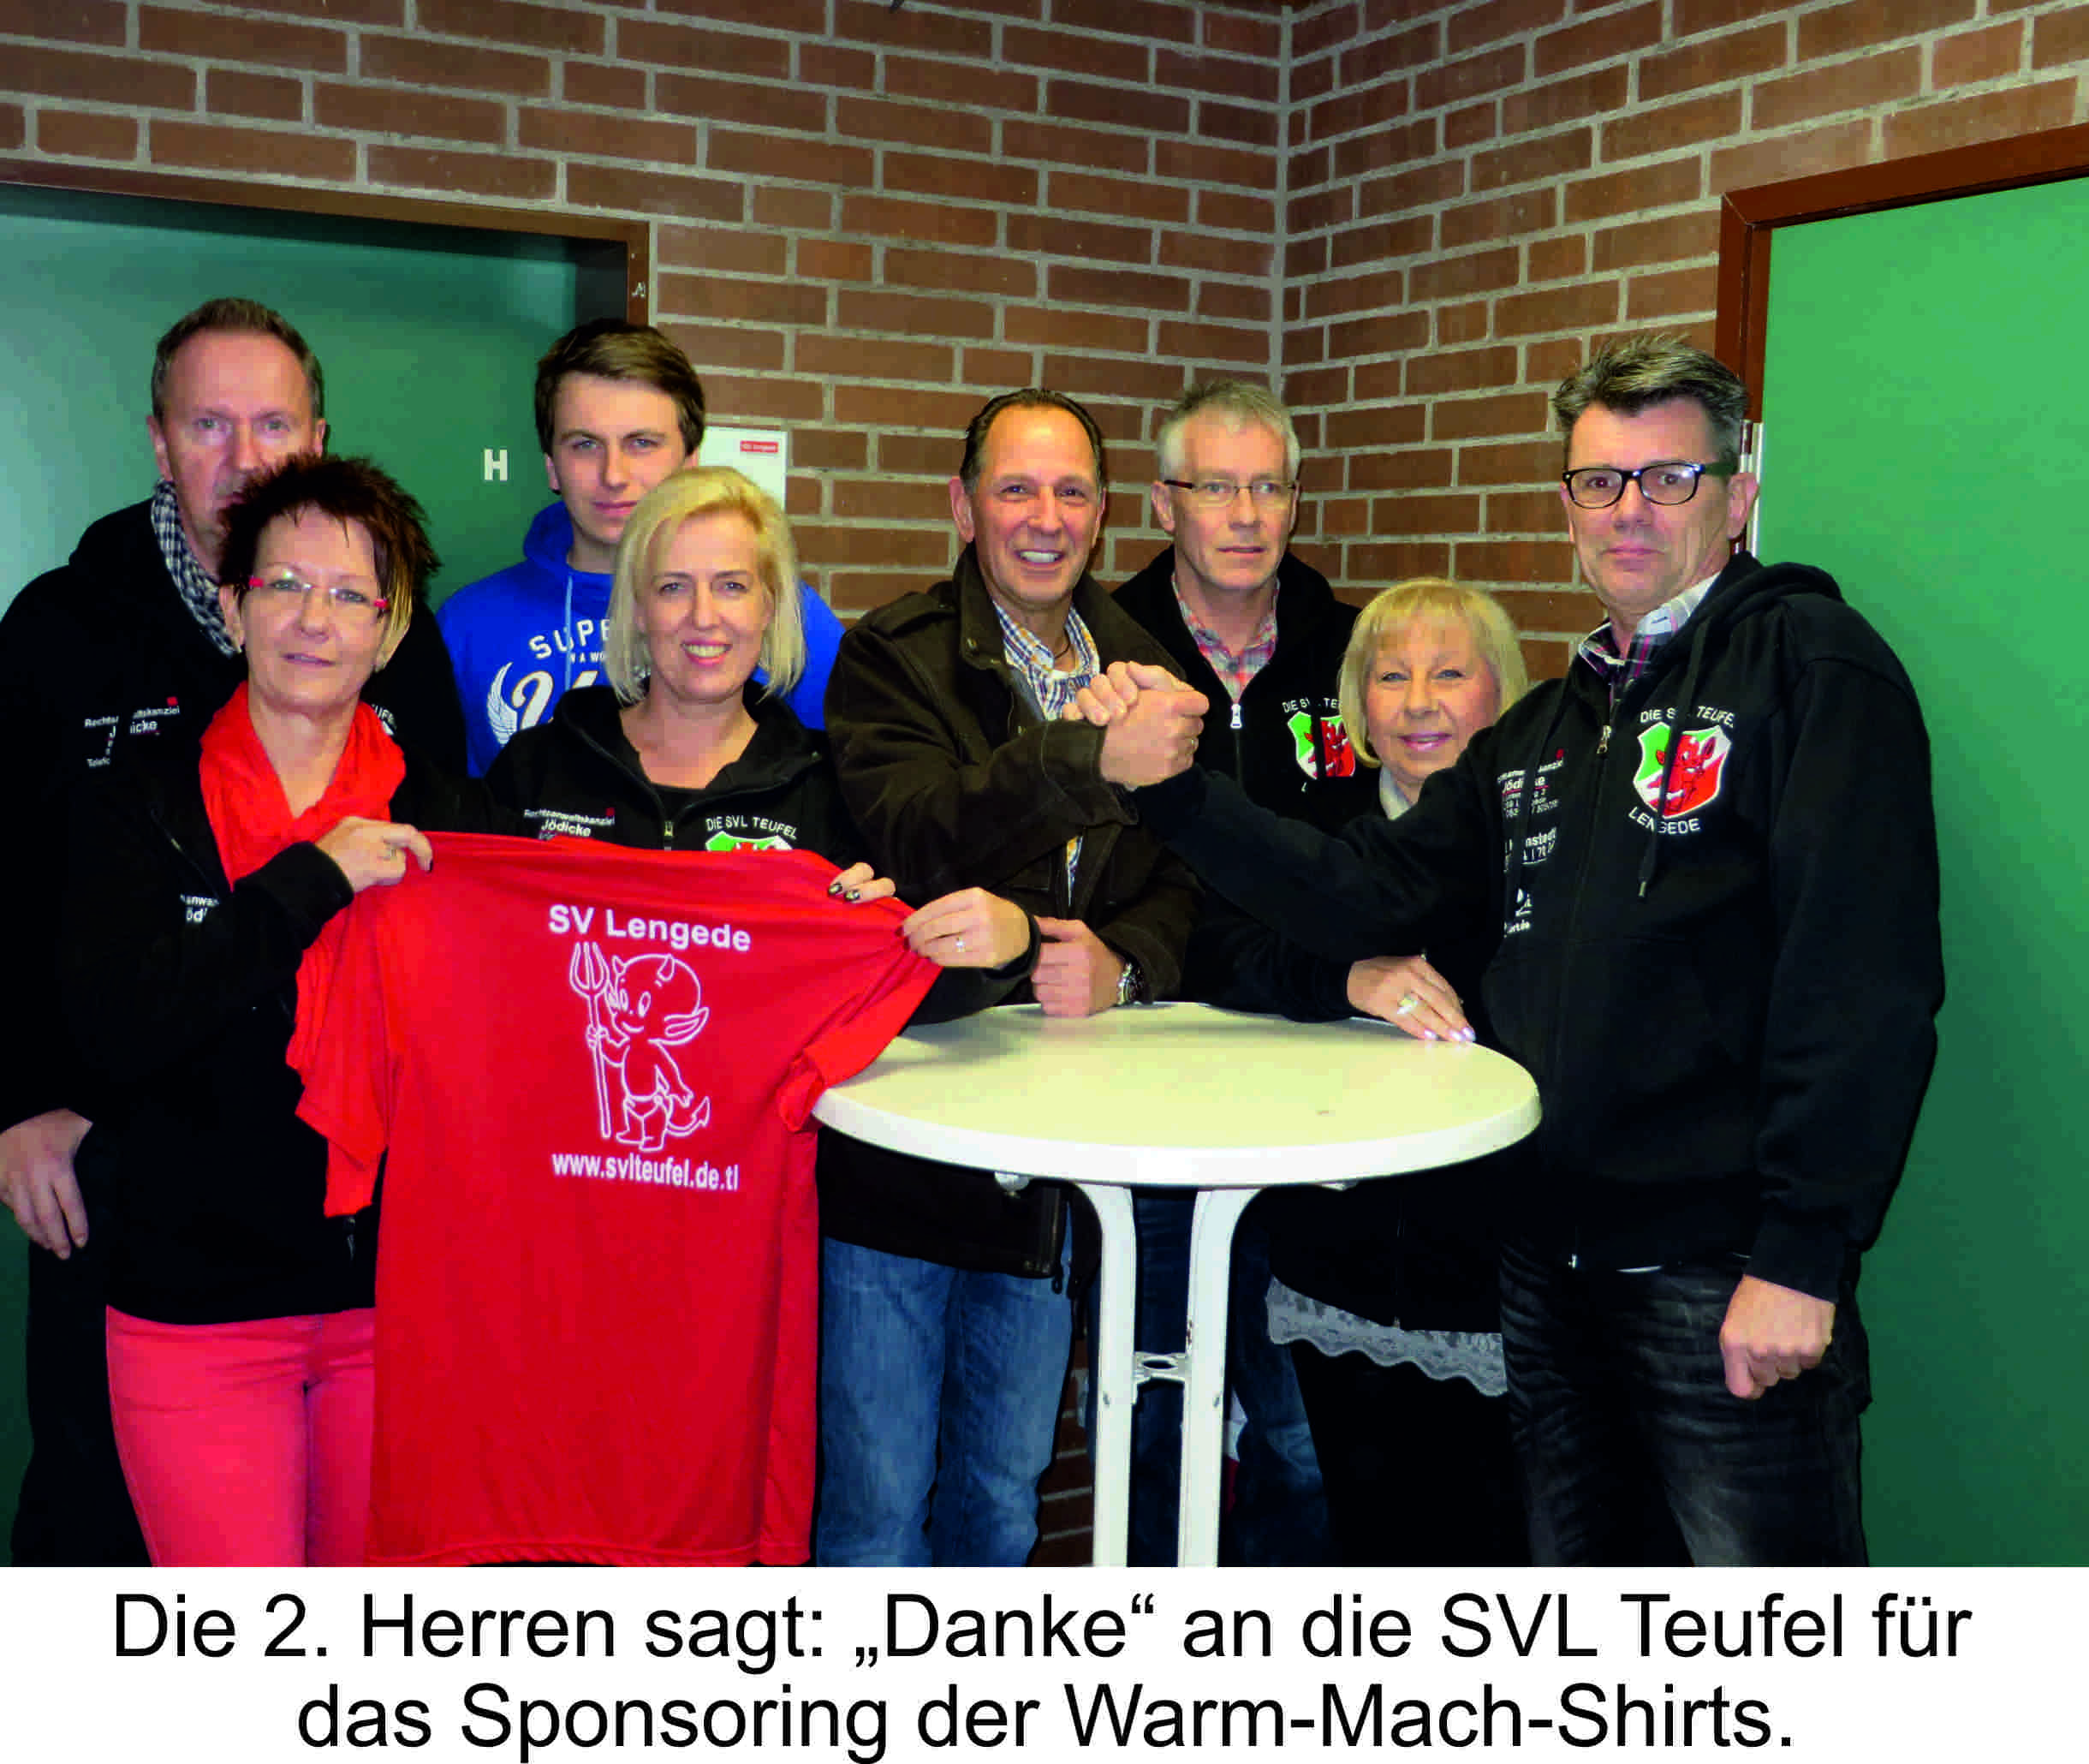 20150127.fussball.2herren.teufel.shirts